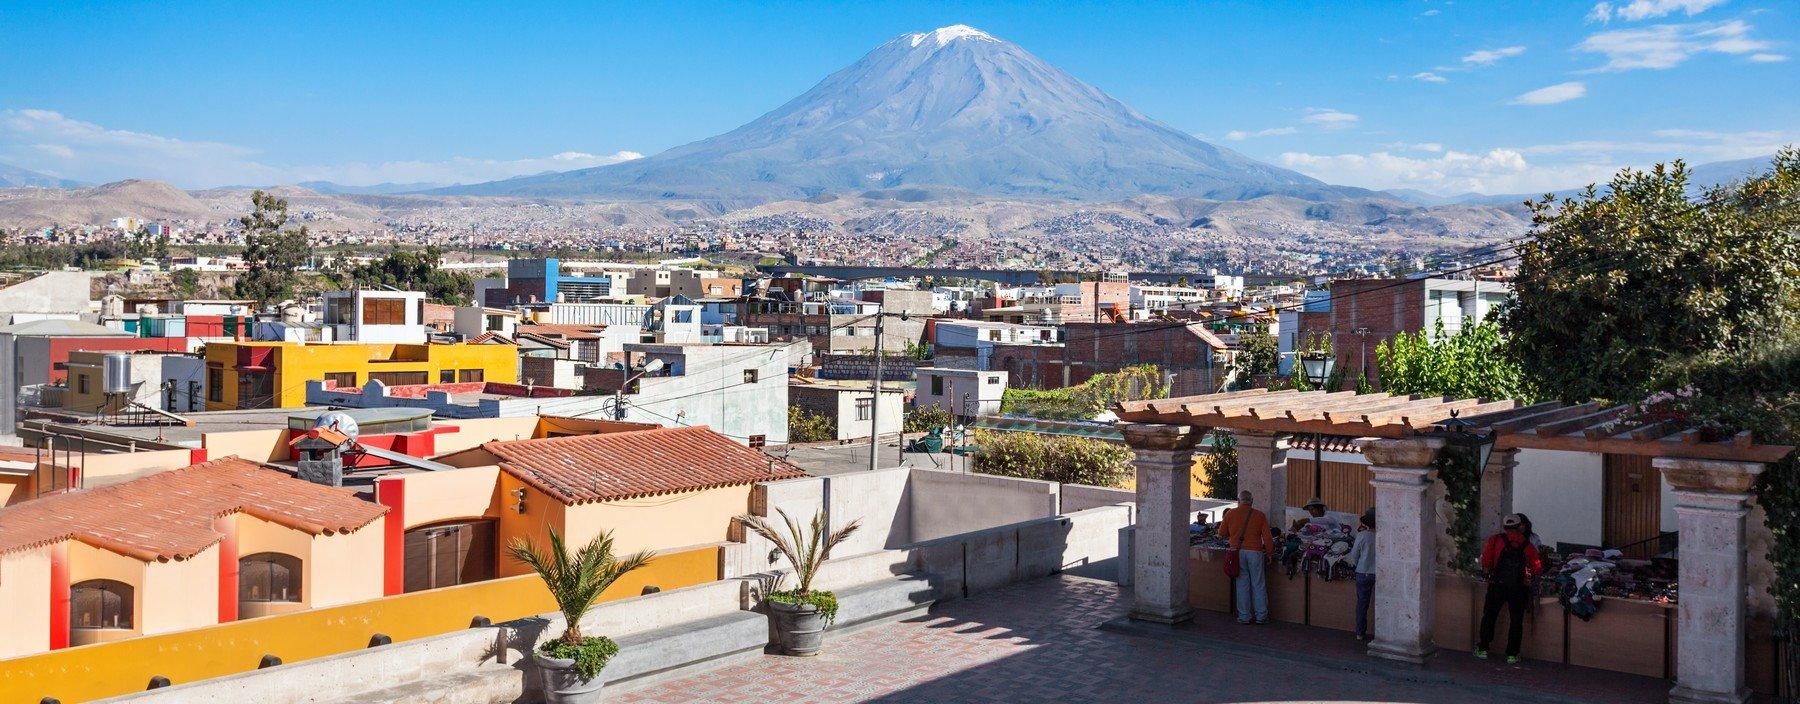 pe, arequipa, el misti vulkaan (2).jpg